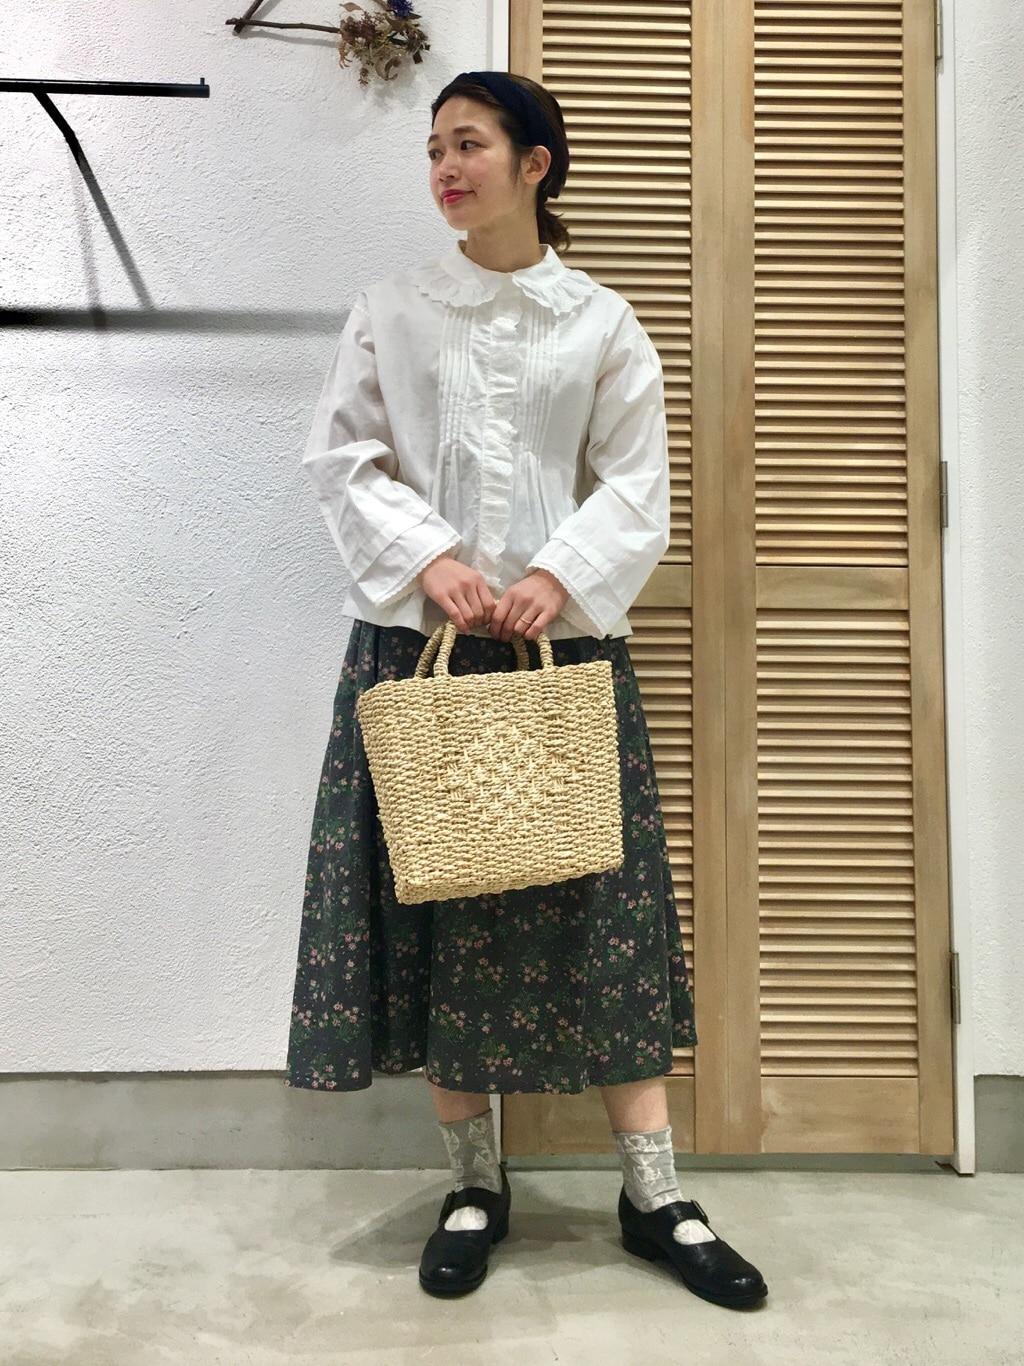 chambre de charme 横浜ジョイナス 身長:160cm 2021.02.26